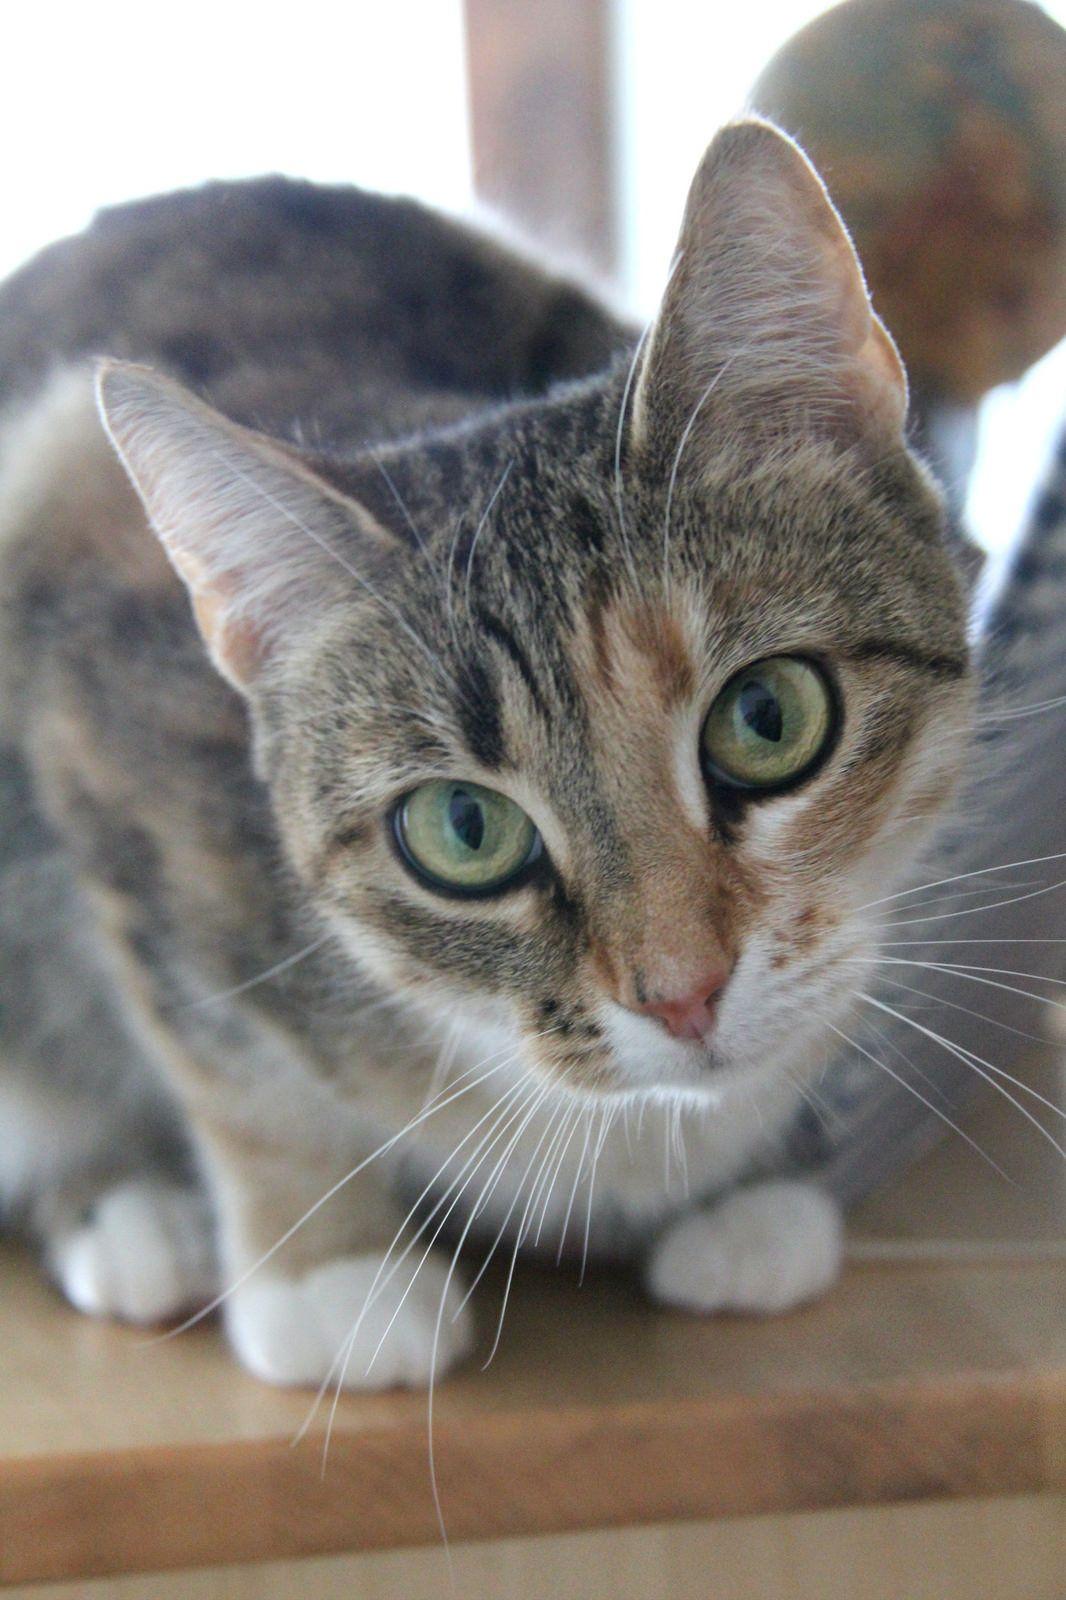 Varpu Varpunen 28 2 2016 rescue cat ex feral cat Twin sister of